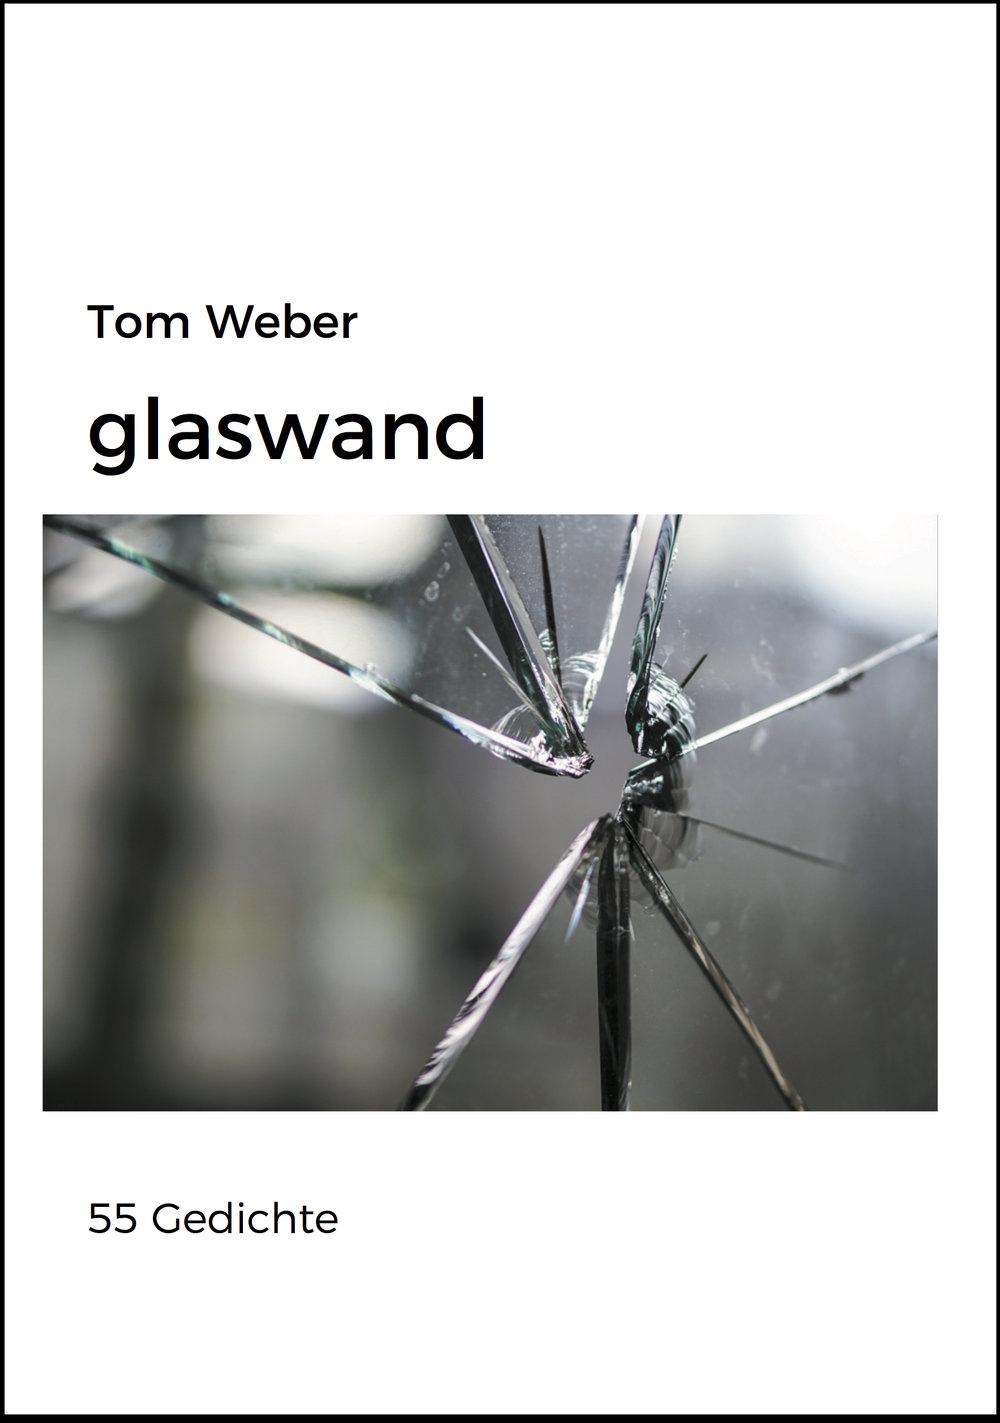 glaswand cover front social media.jpg